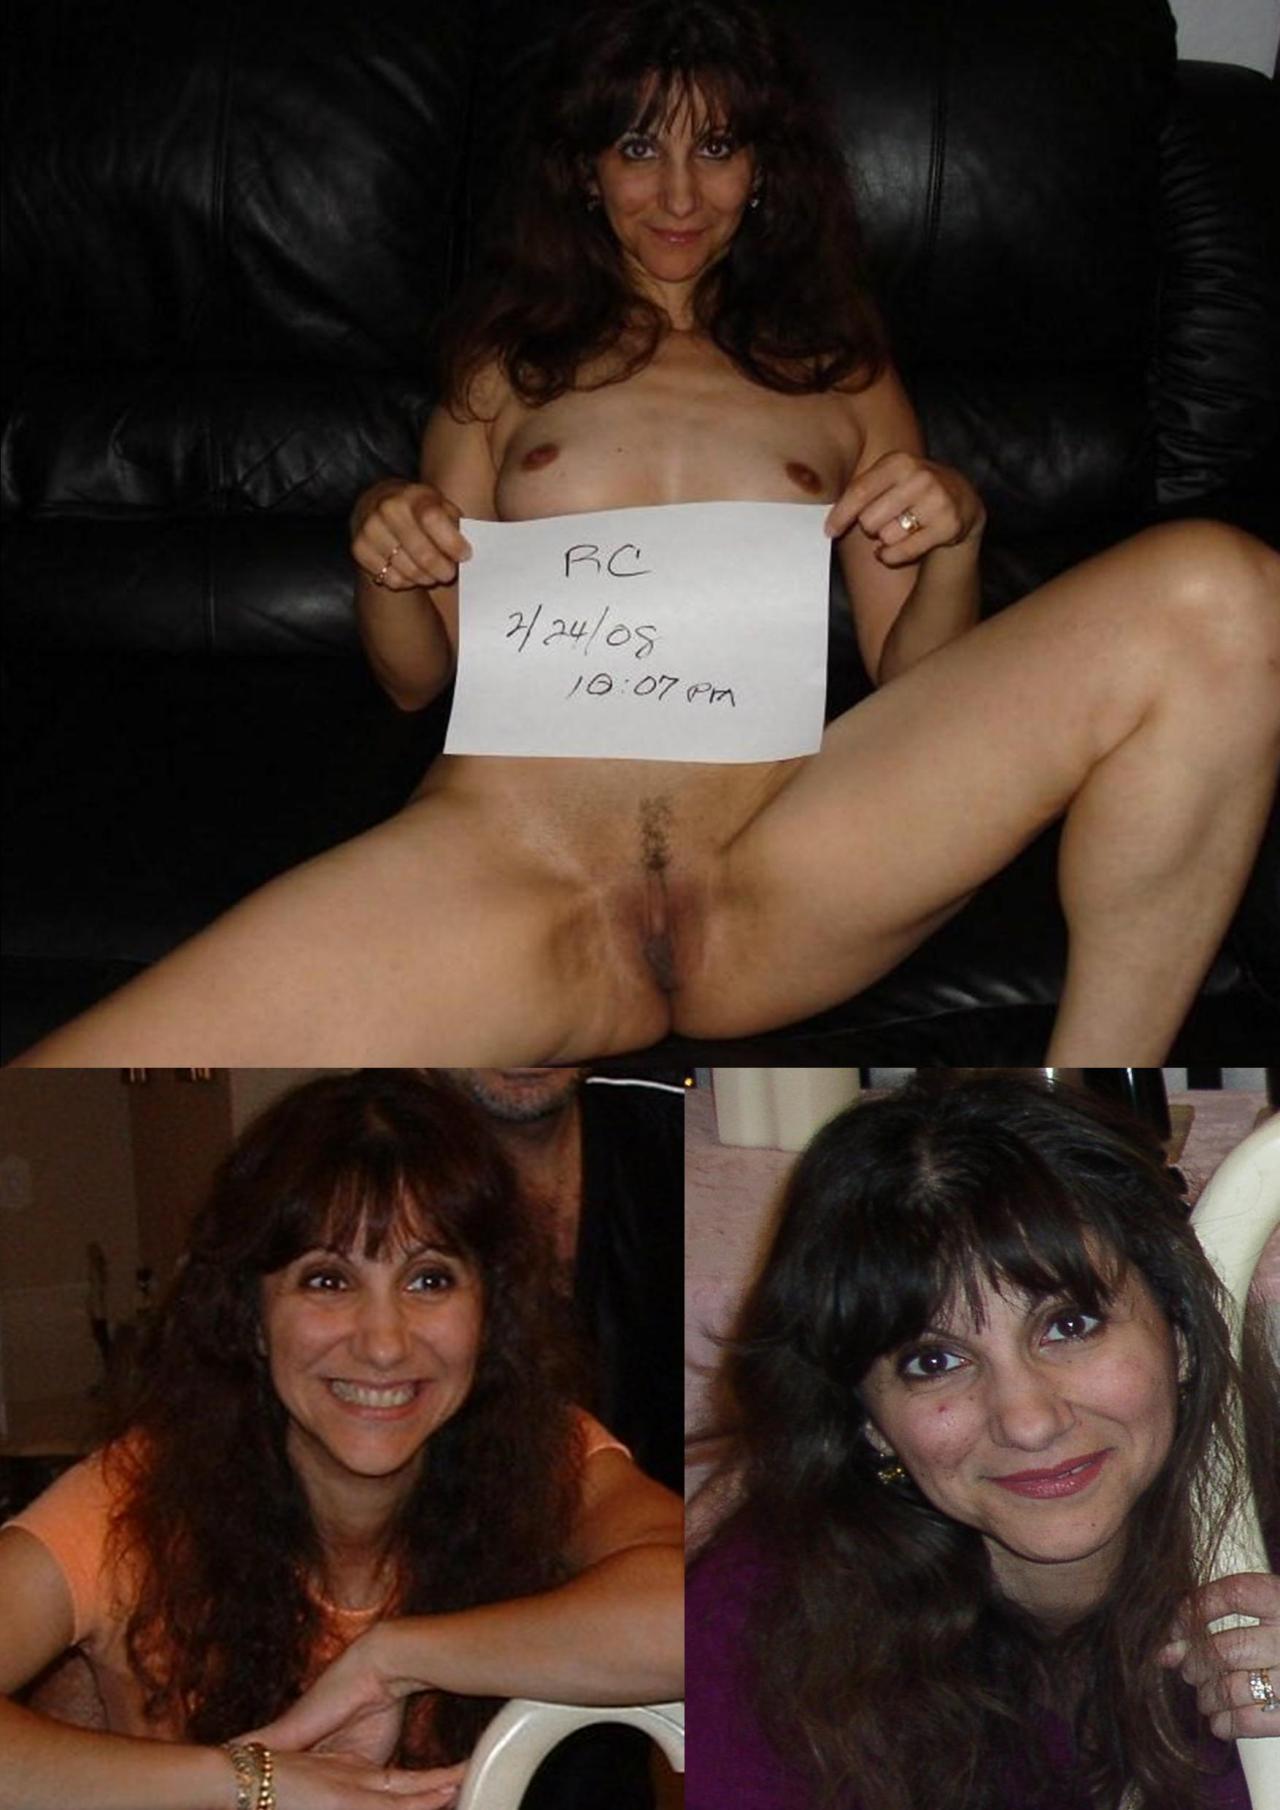 old pussy versus virgin pussy